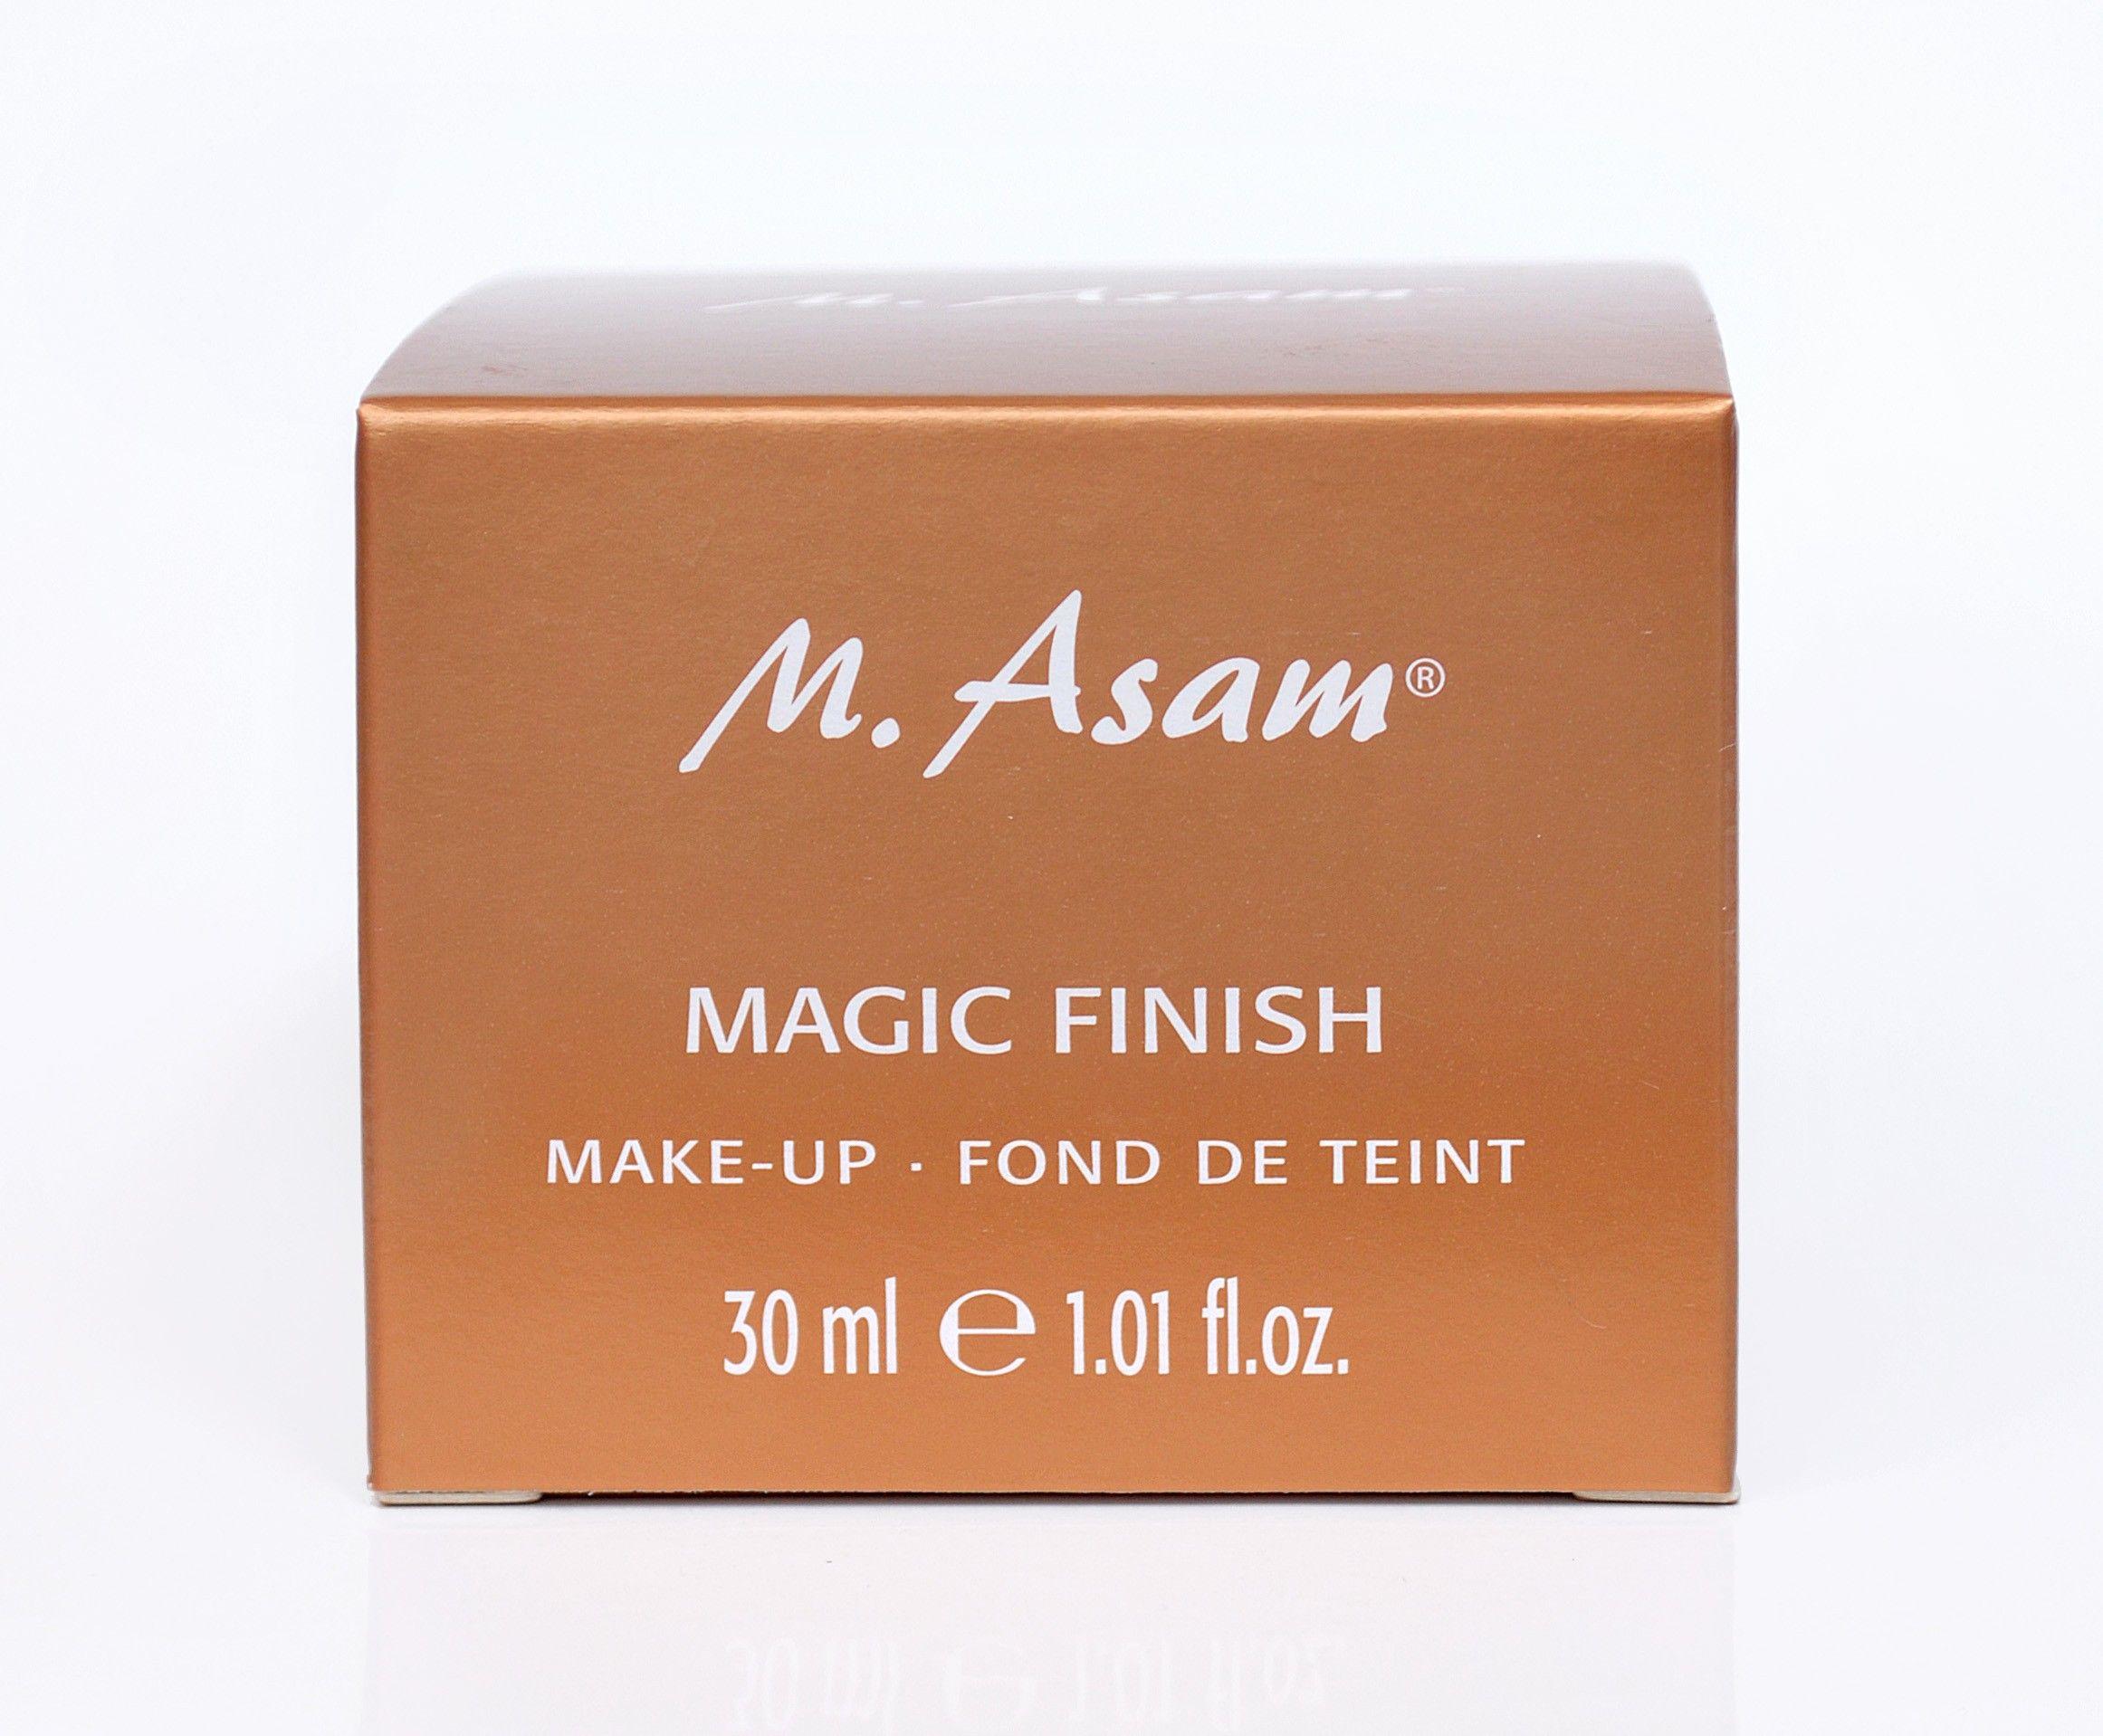 M Asam Magic Finish Makeup 30ml Makeup Mousse Uneven Skin Tone